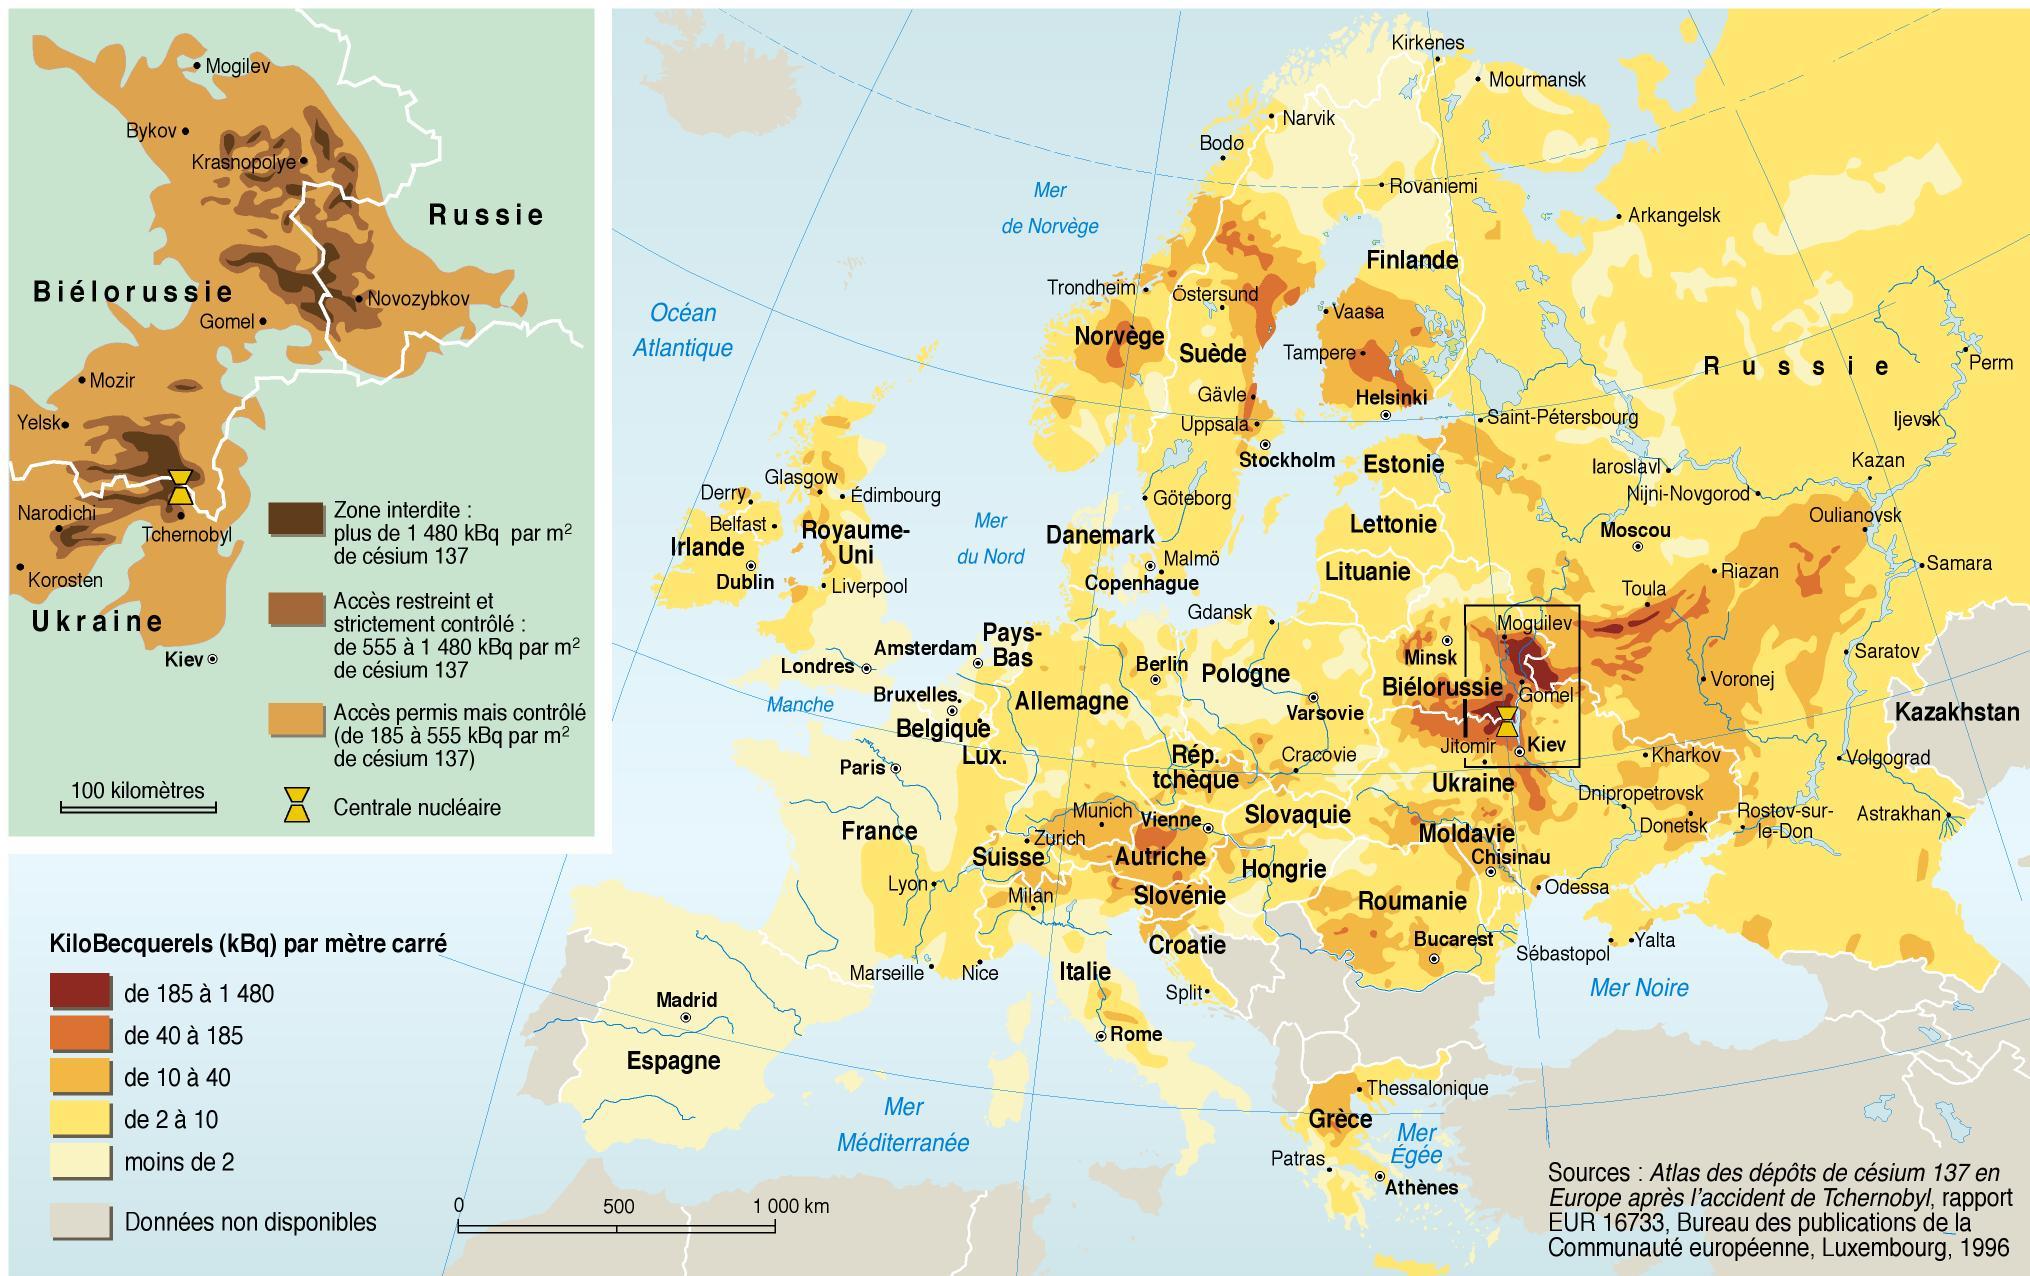 Tchernobyl en Biélorussie, par Benjamin Vautrin (Les blogs du